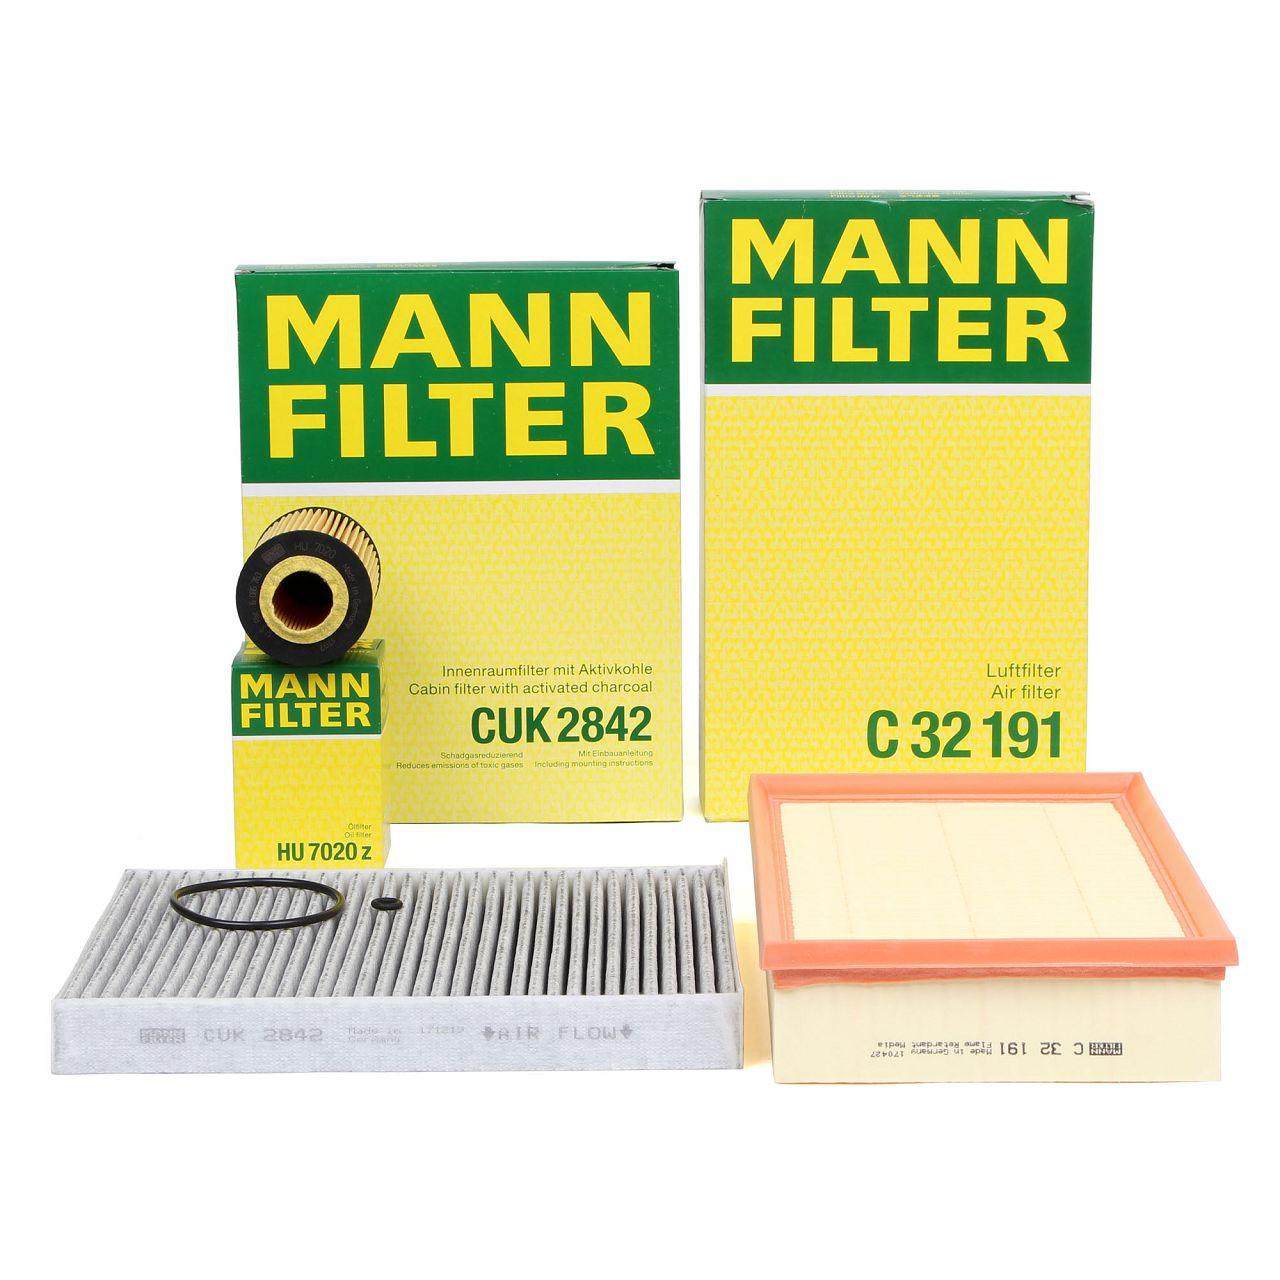 MANN Inspektionskit Filterpaket für VW MULTIVAN TRANSPORTER T6 2.0 TDI 84-204 PS